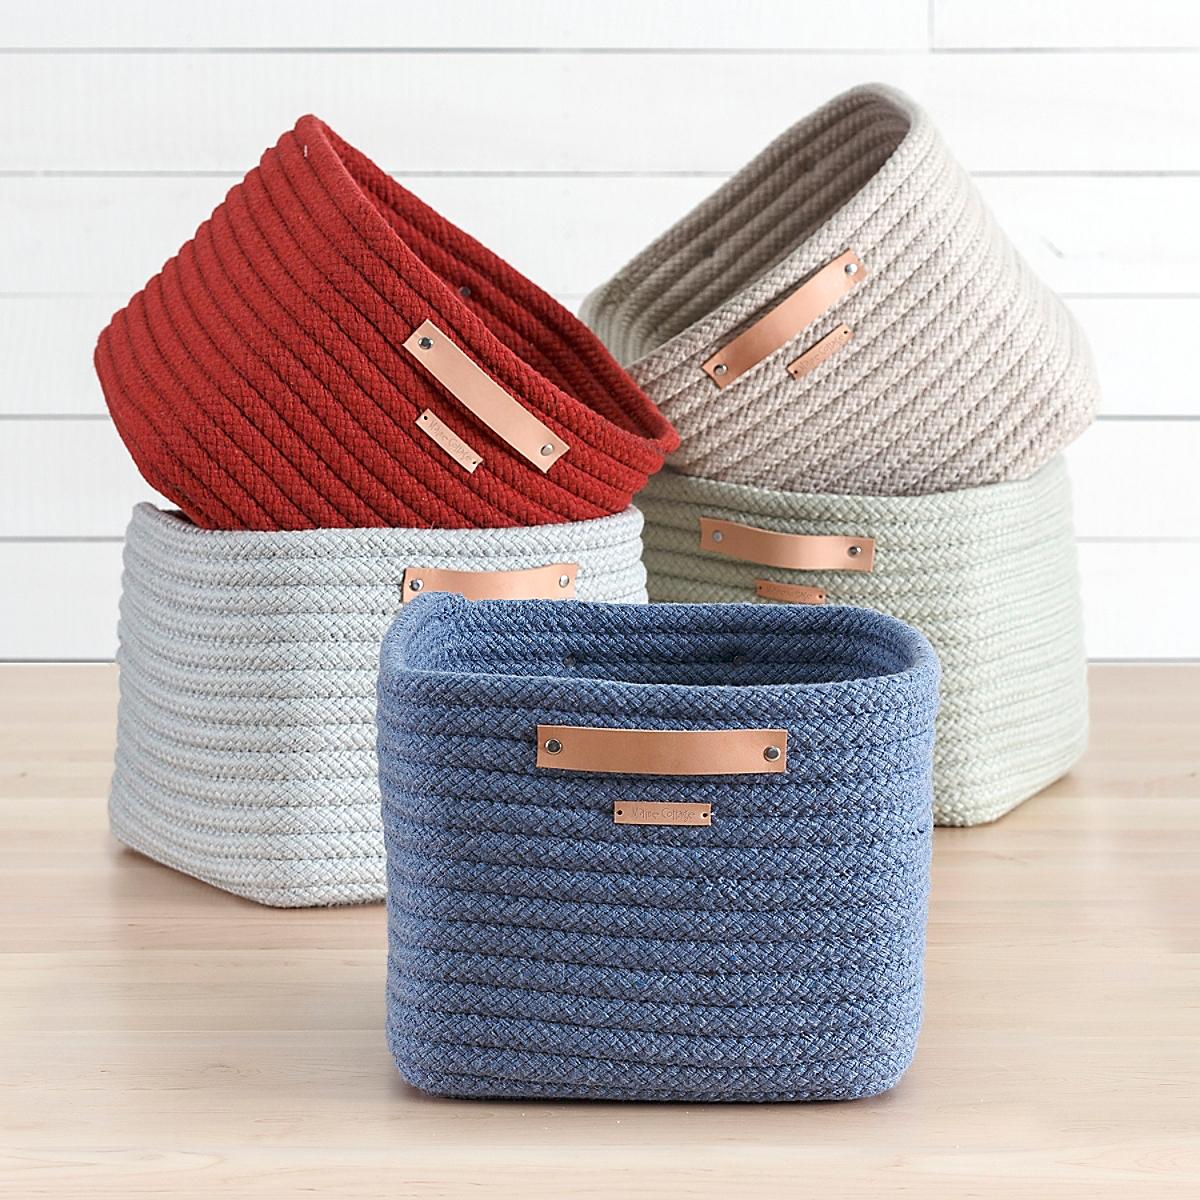 Braided Sunbrella Stow-Away Basket